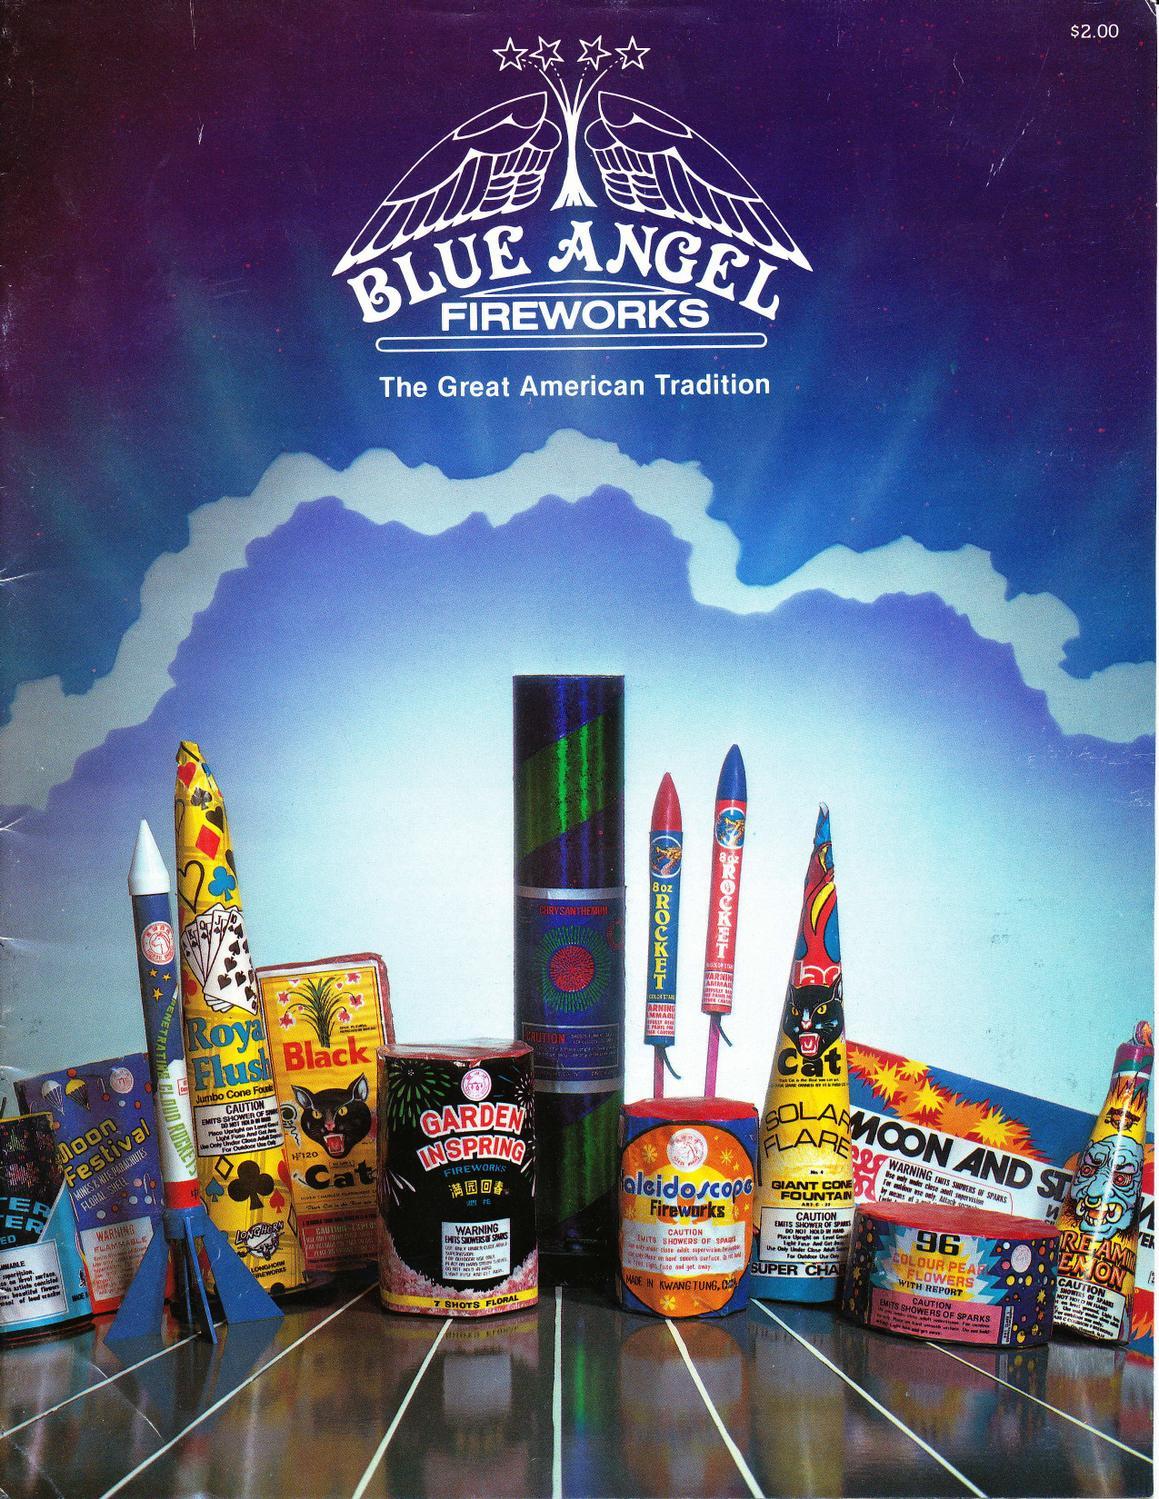 2 Cherry Bomb 91 Shot Saturn Suprise Color Missile Battery Fireworks Label Bonus July 4th Holiday & Seasonal